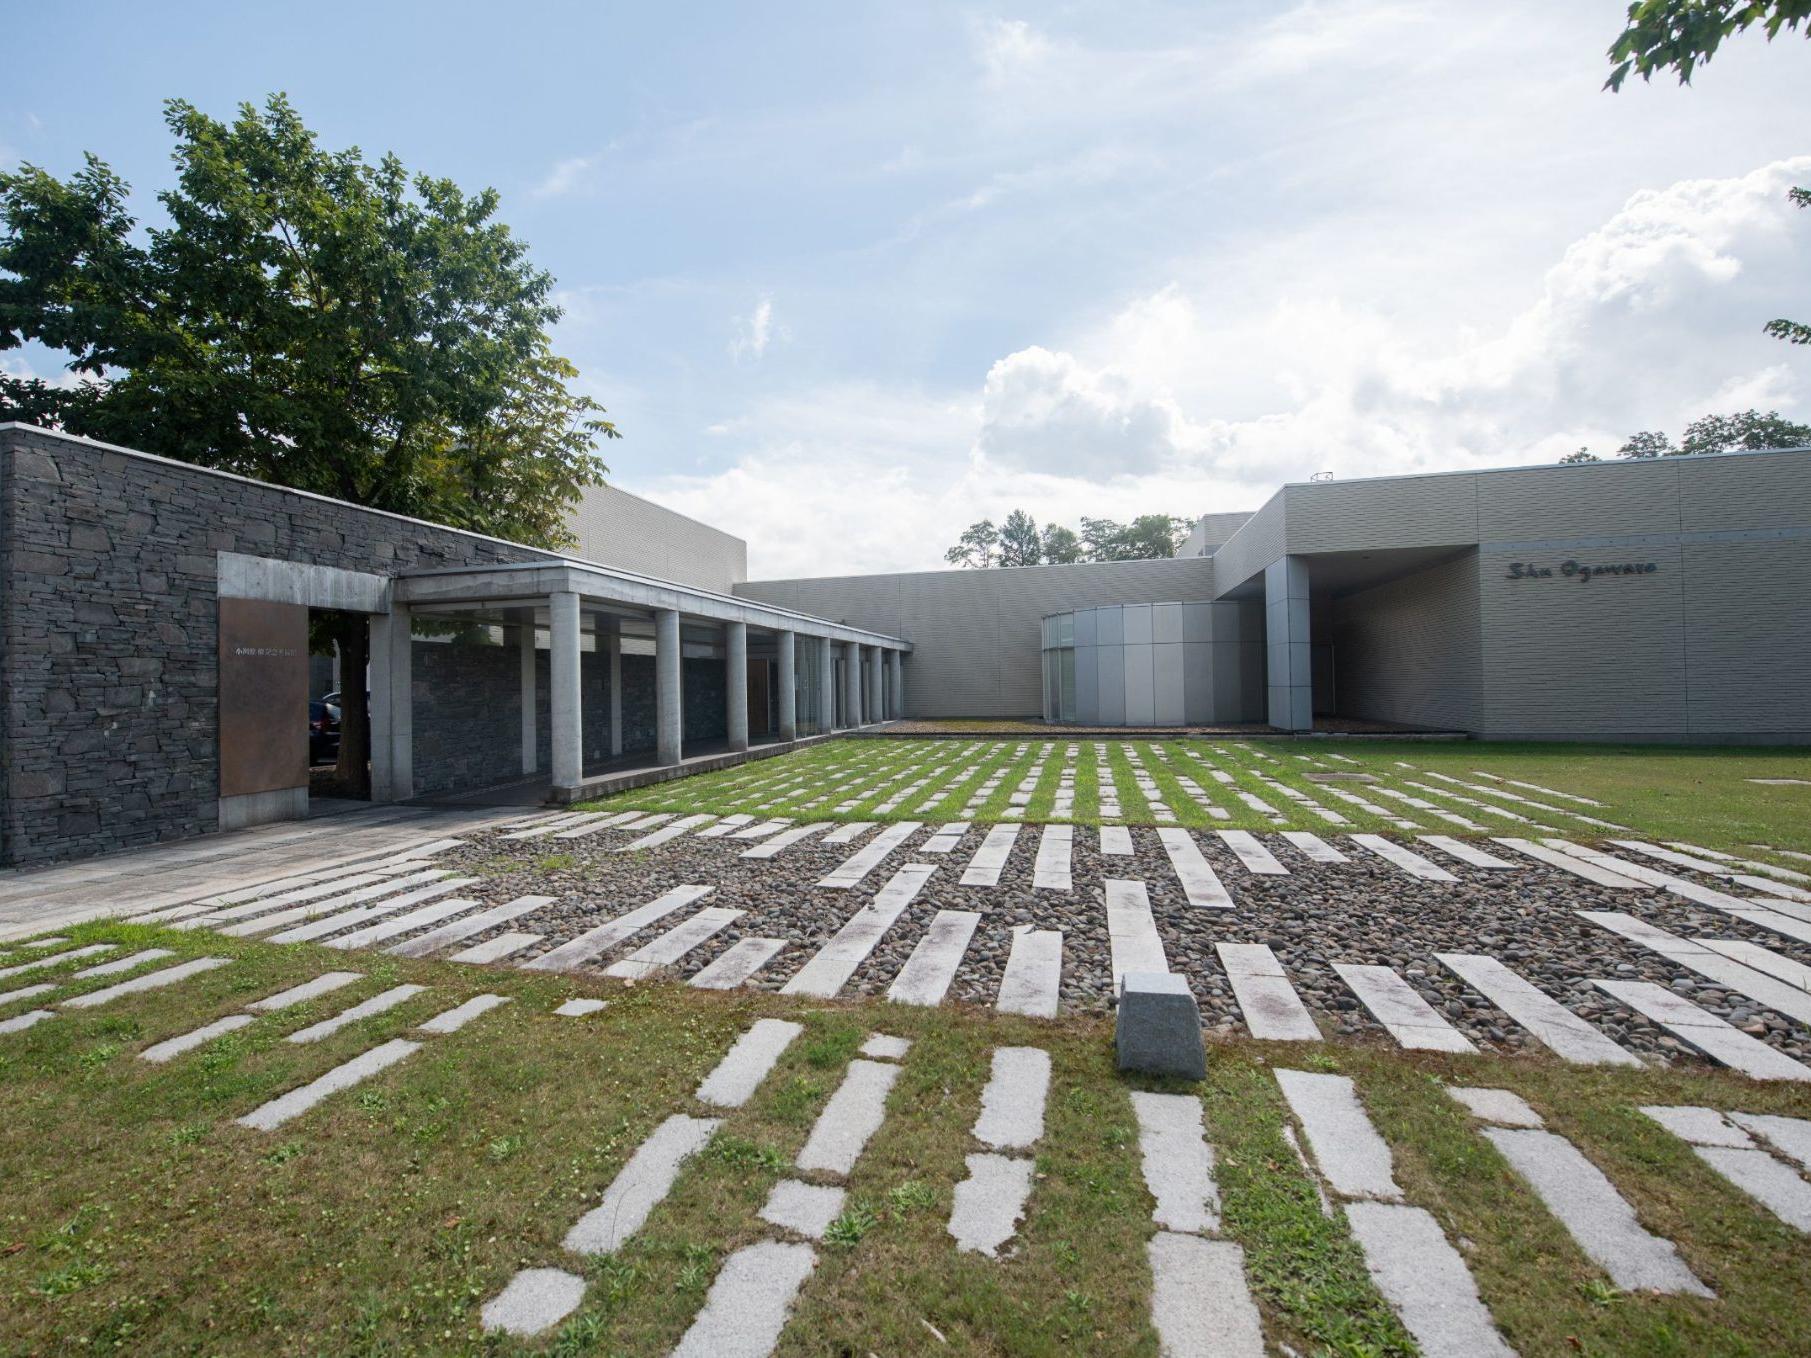 Outlook of Shu ogawara museum of art near Chatrium Niseko Japan